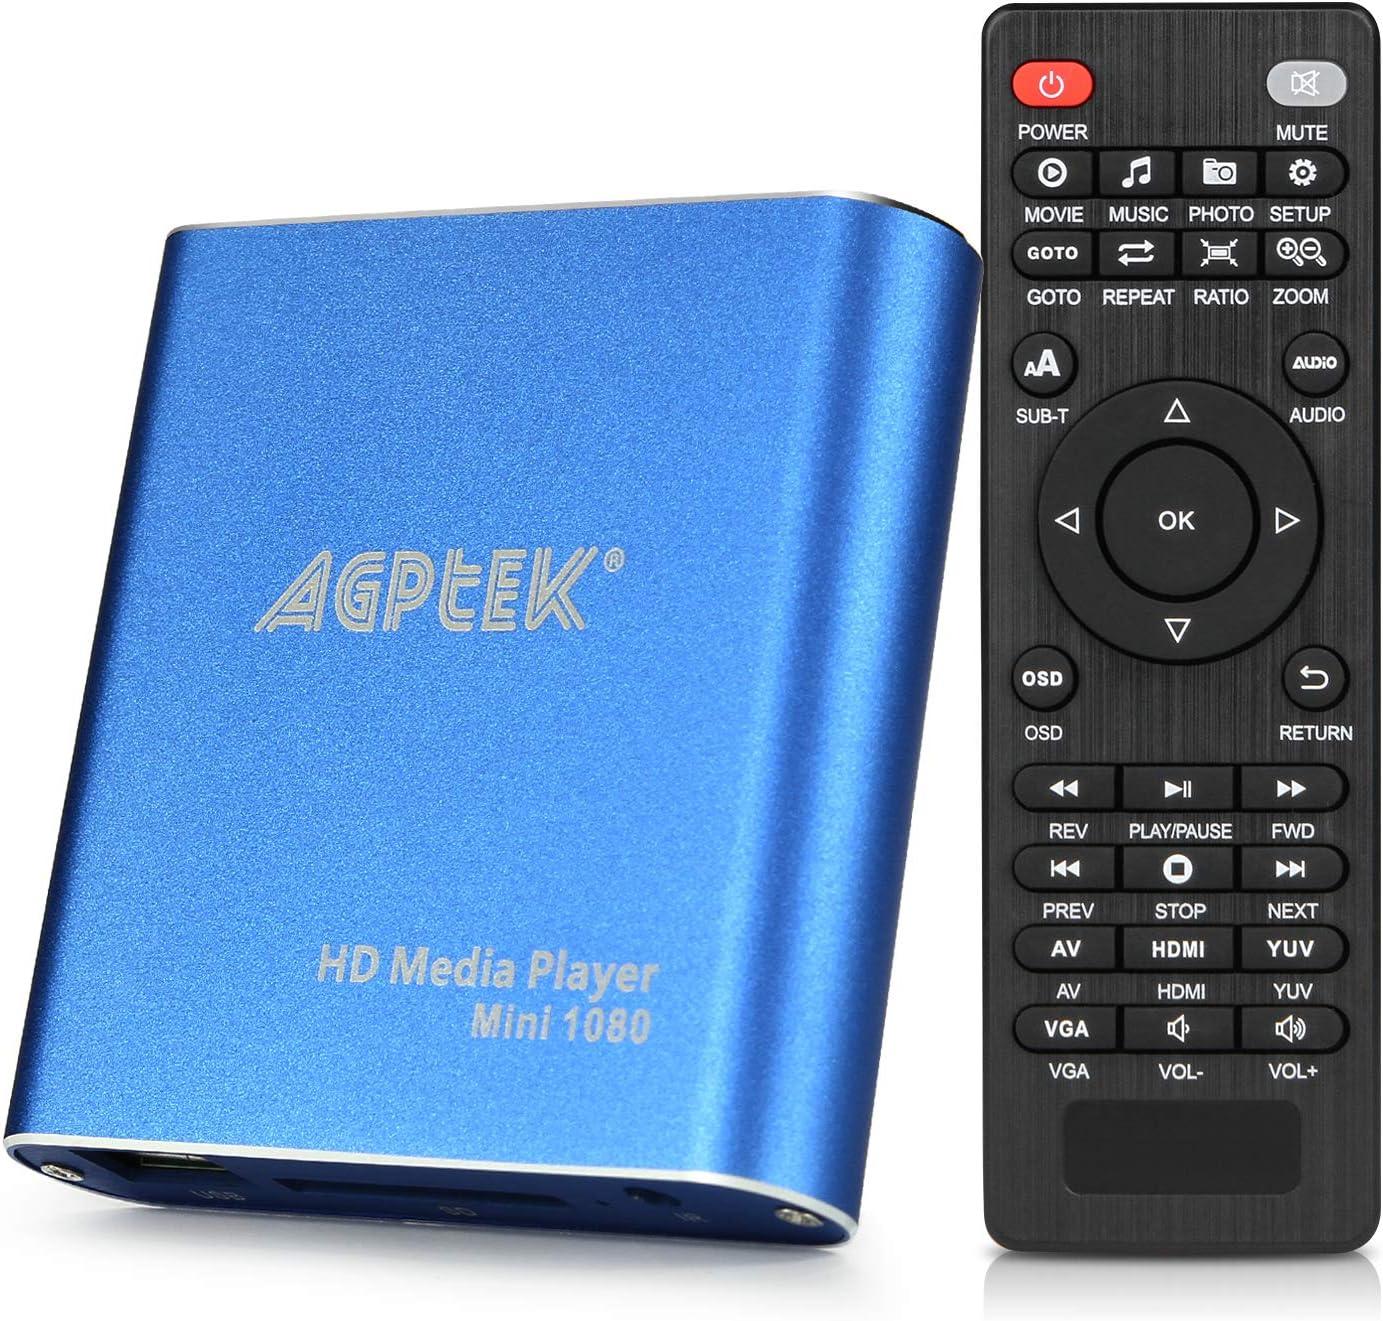 HDMI Media Player Translated Blue Mini Full-HD Ultra MP4 1080p Gifts